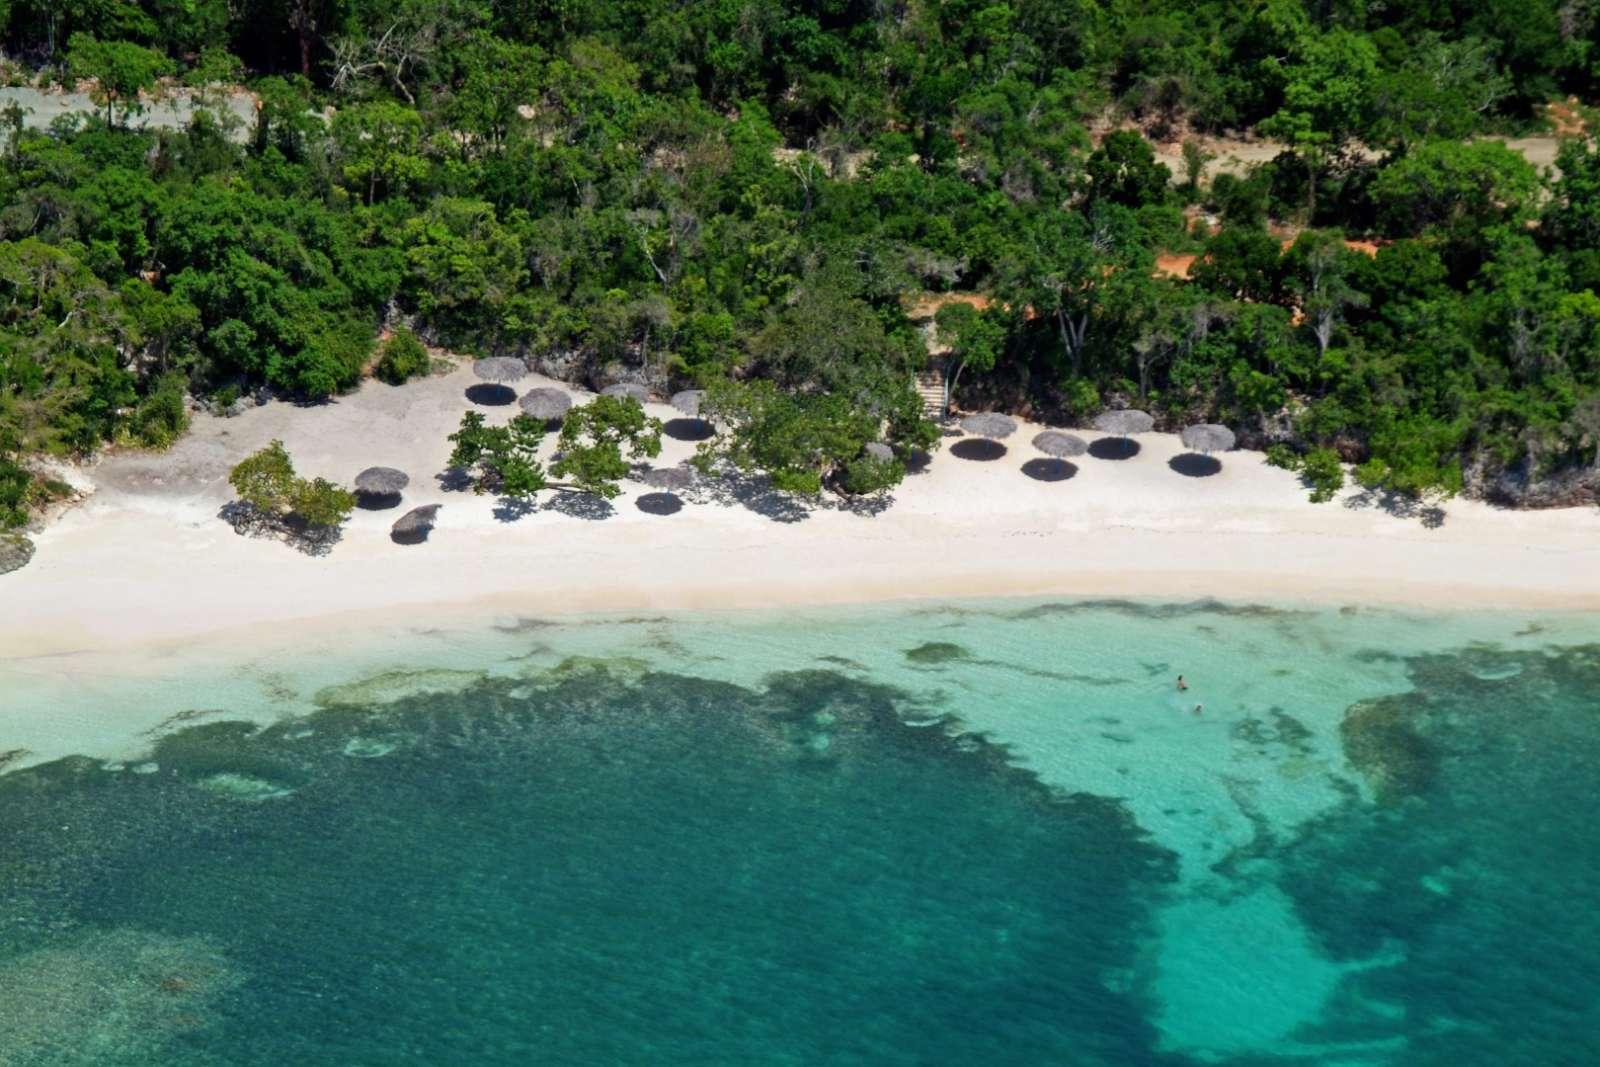 Aerial view of the beach at Paradisus Rio de Oro